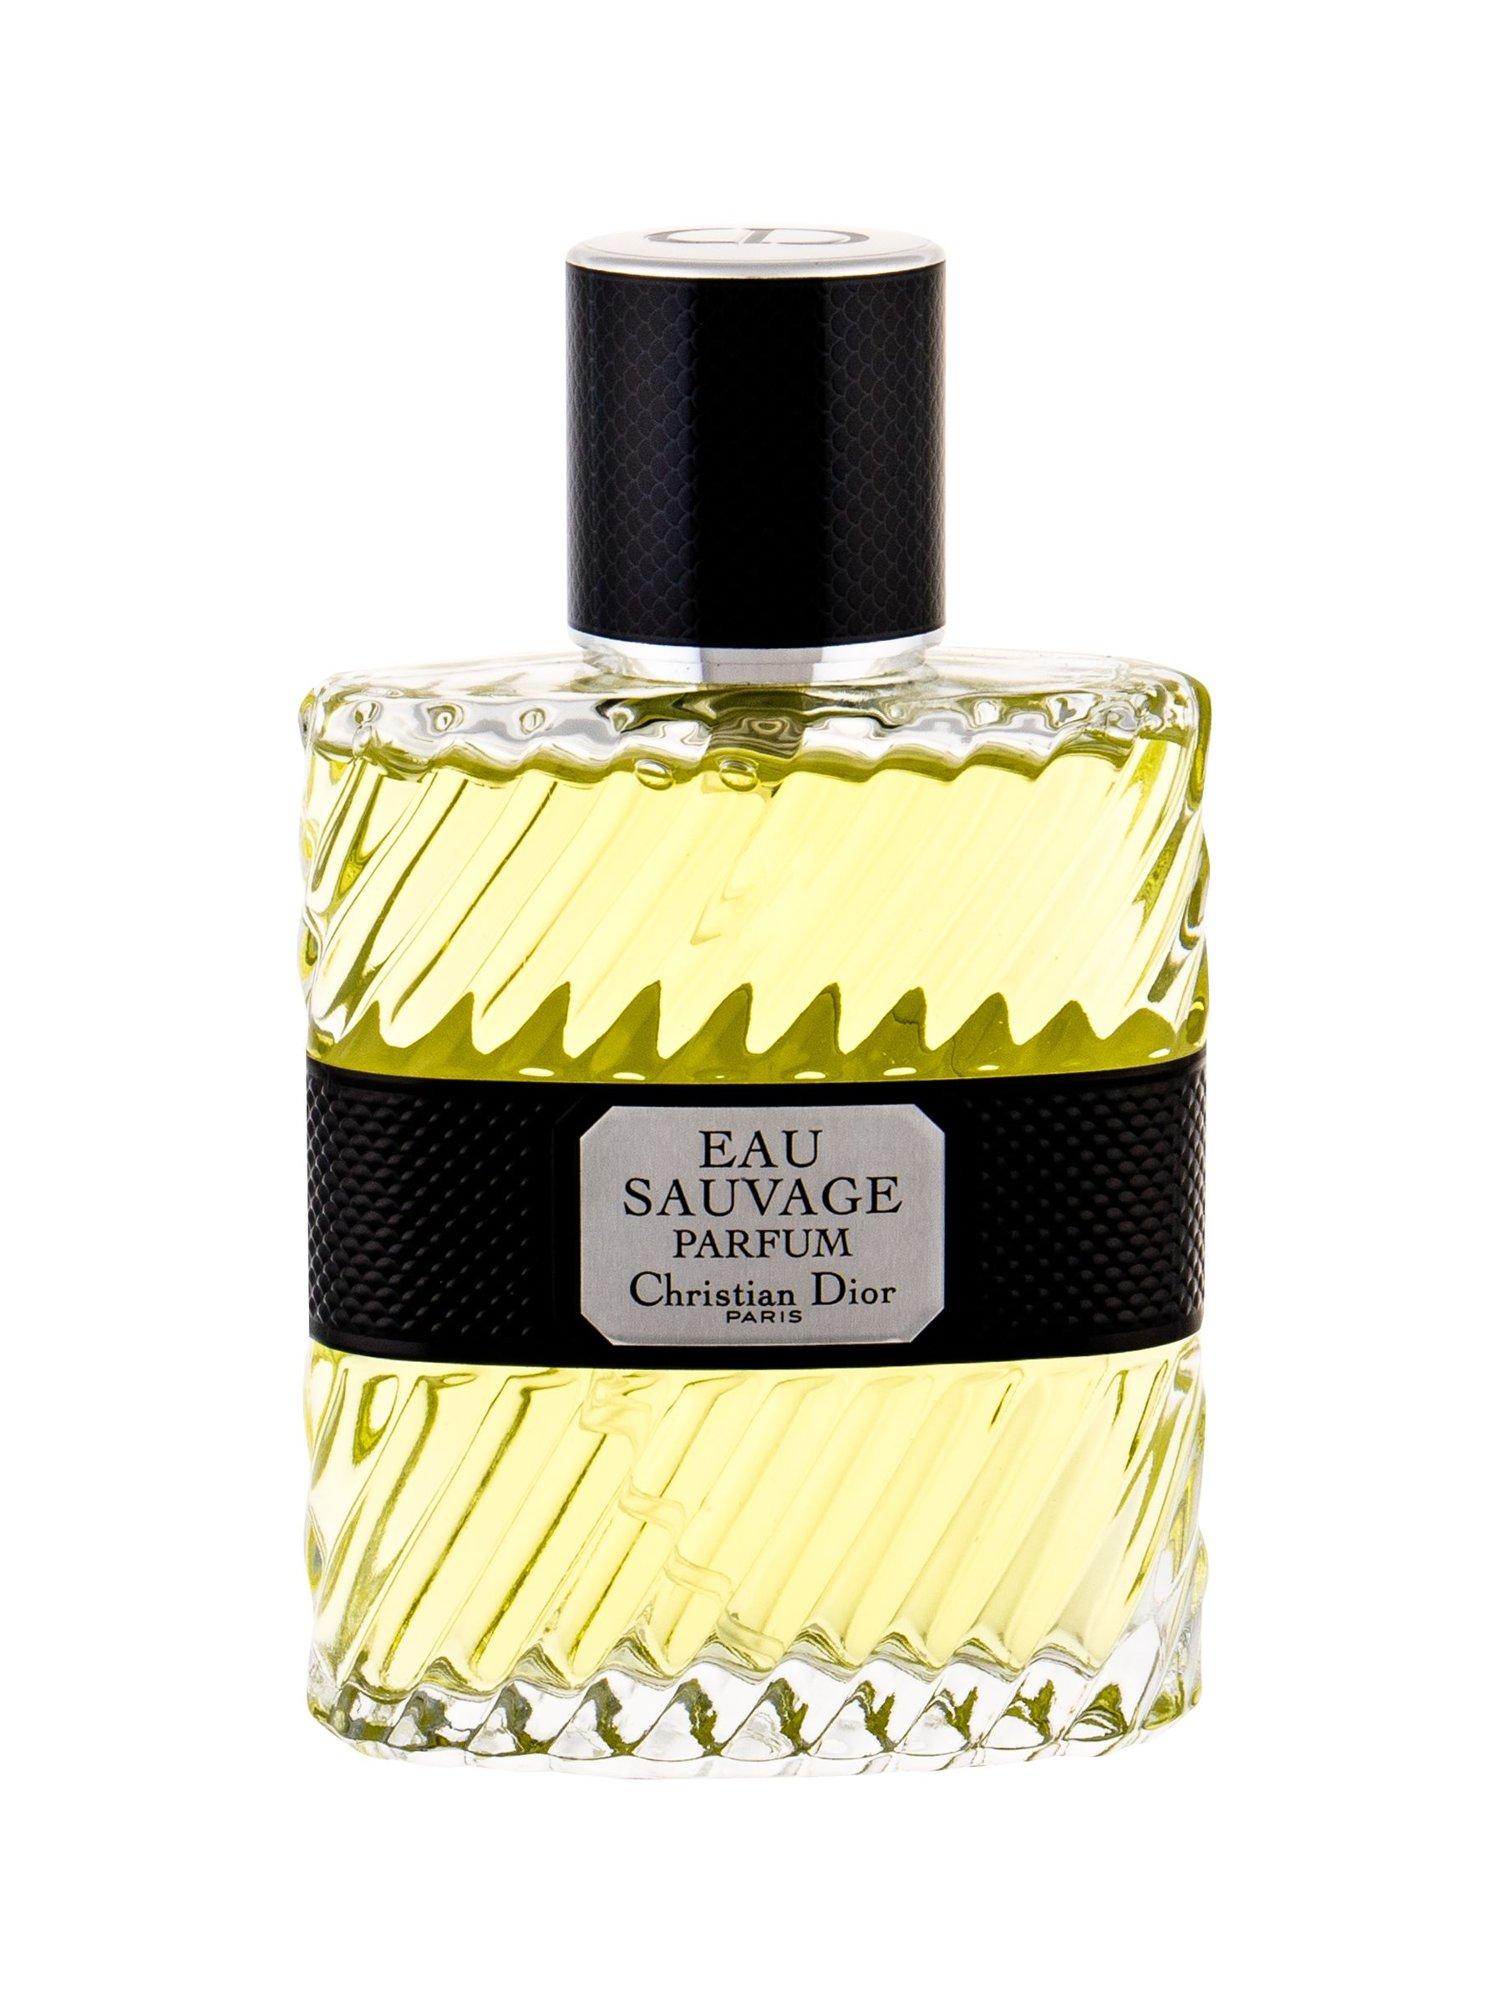 Christian Dior Eau Sauvage Parfum Eau de Parfum 50ml